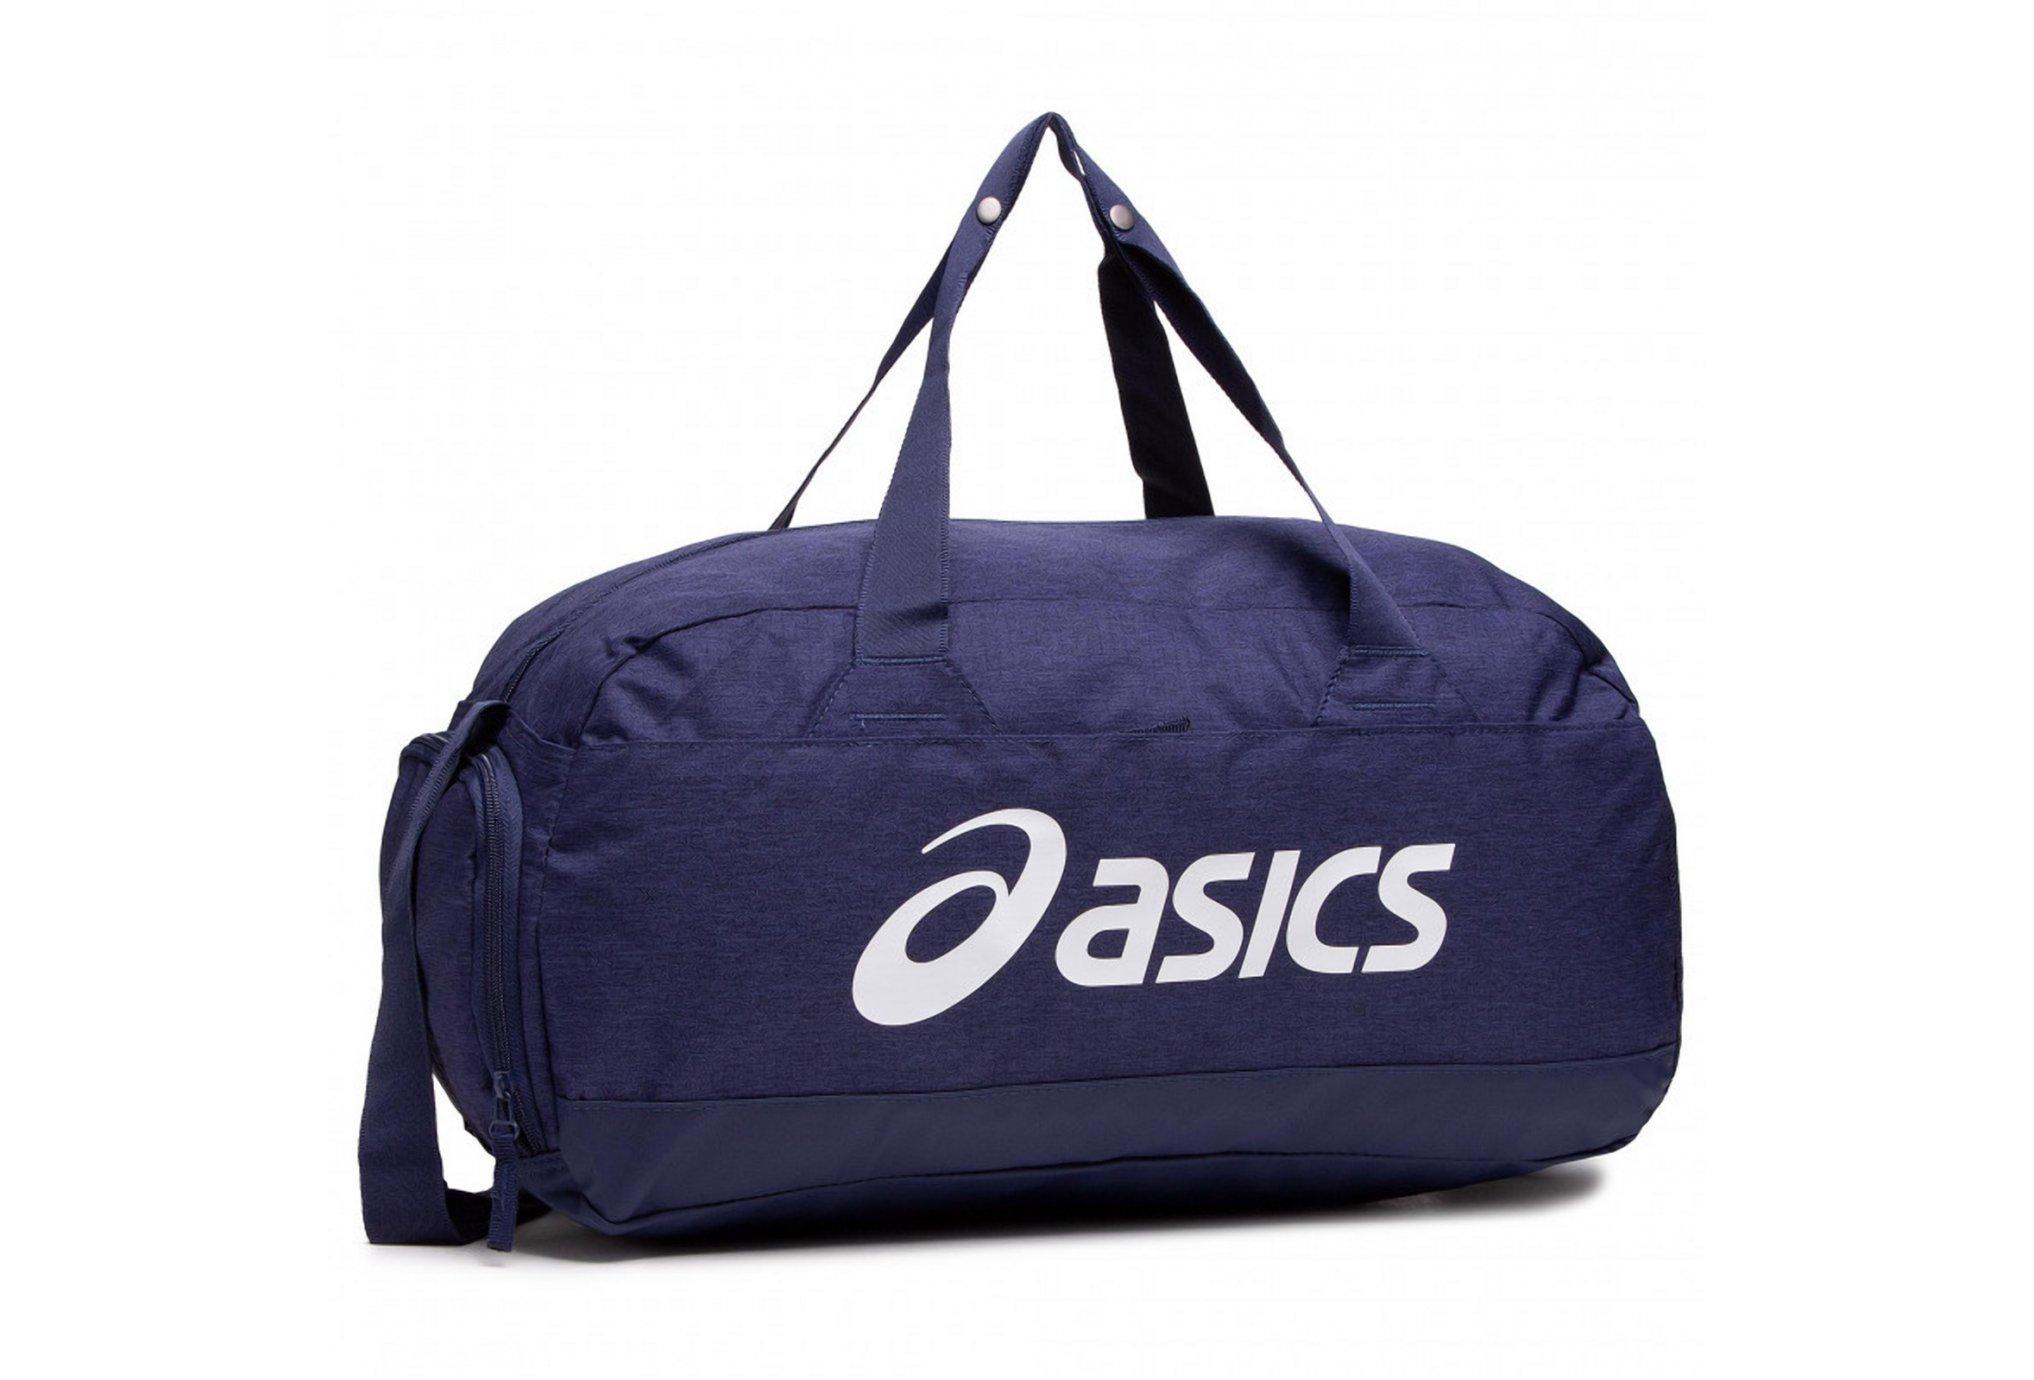 Asics Sports Bag - S Sac de sport